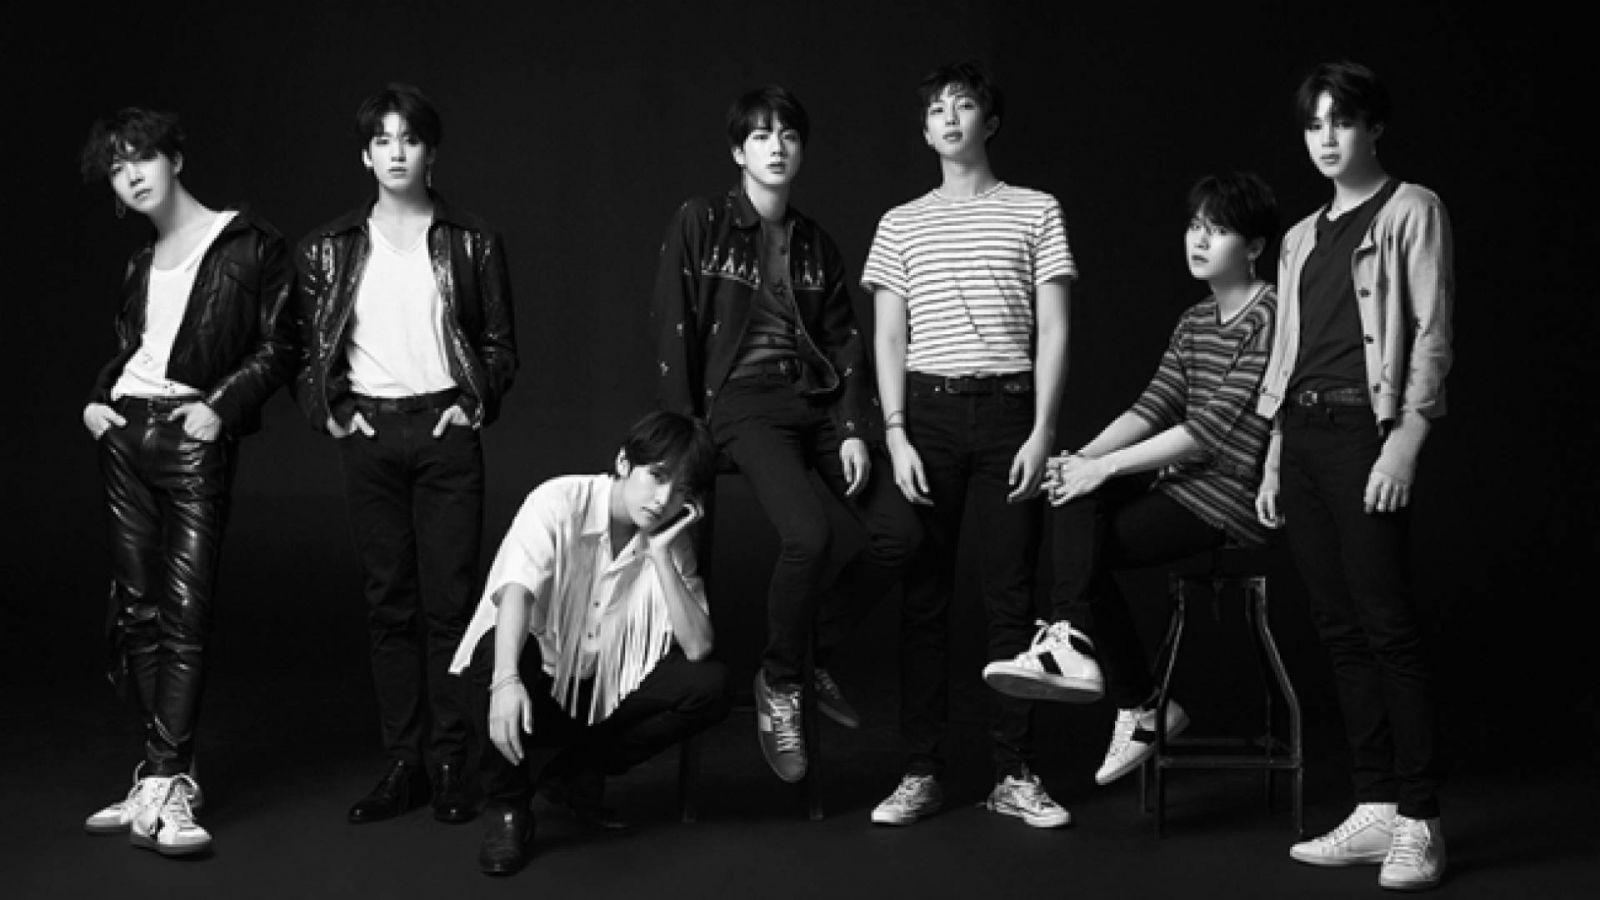 BTS valmistautuu Love Yourself: Tear -levyn julkaisuun © Big Hit Entertainment All Rights Reserved